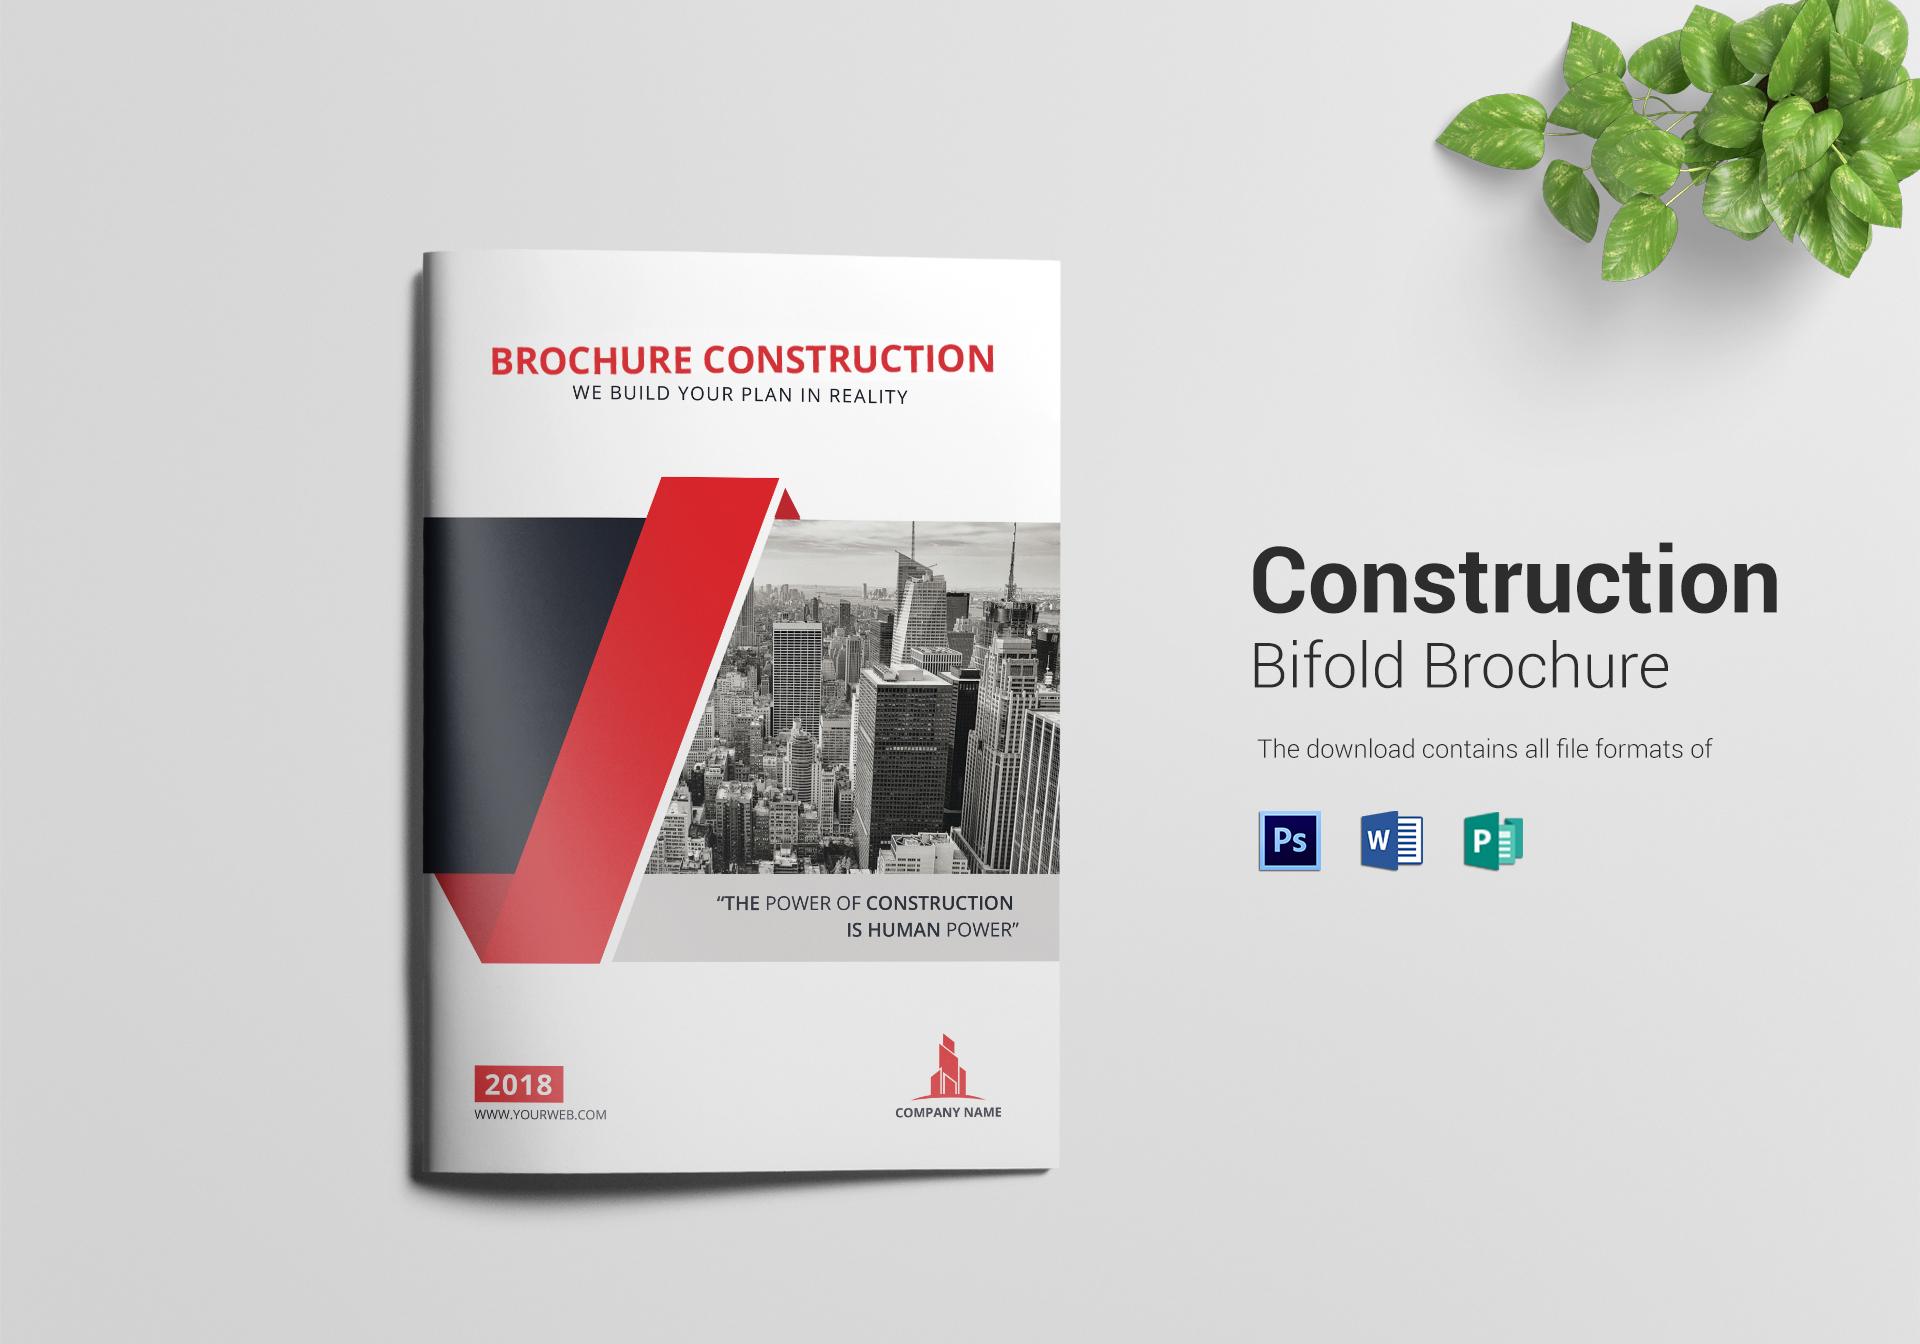 construction power bifold brochure sample